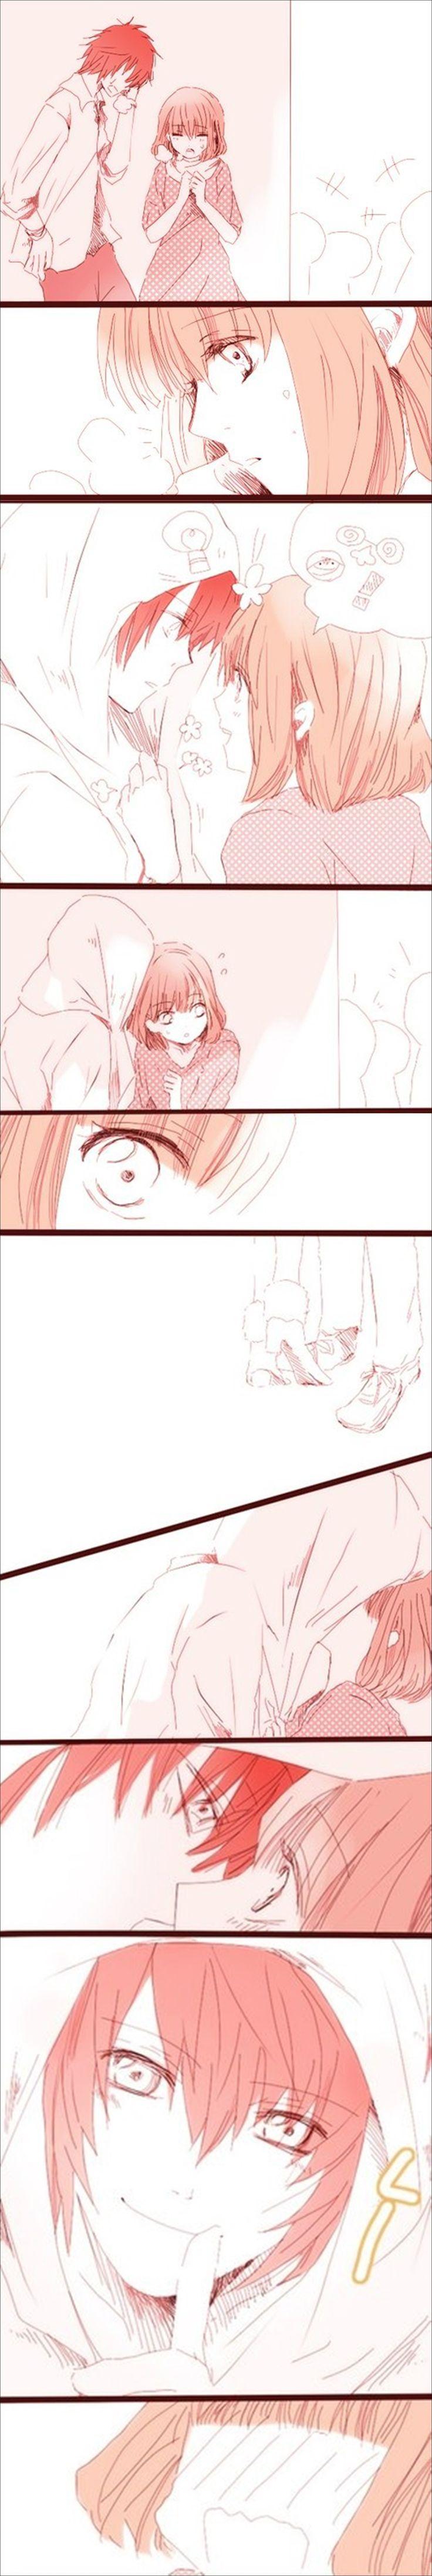 Uta no Prince-sama - Otoya and Haruka this just made my day!!!